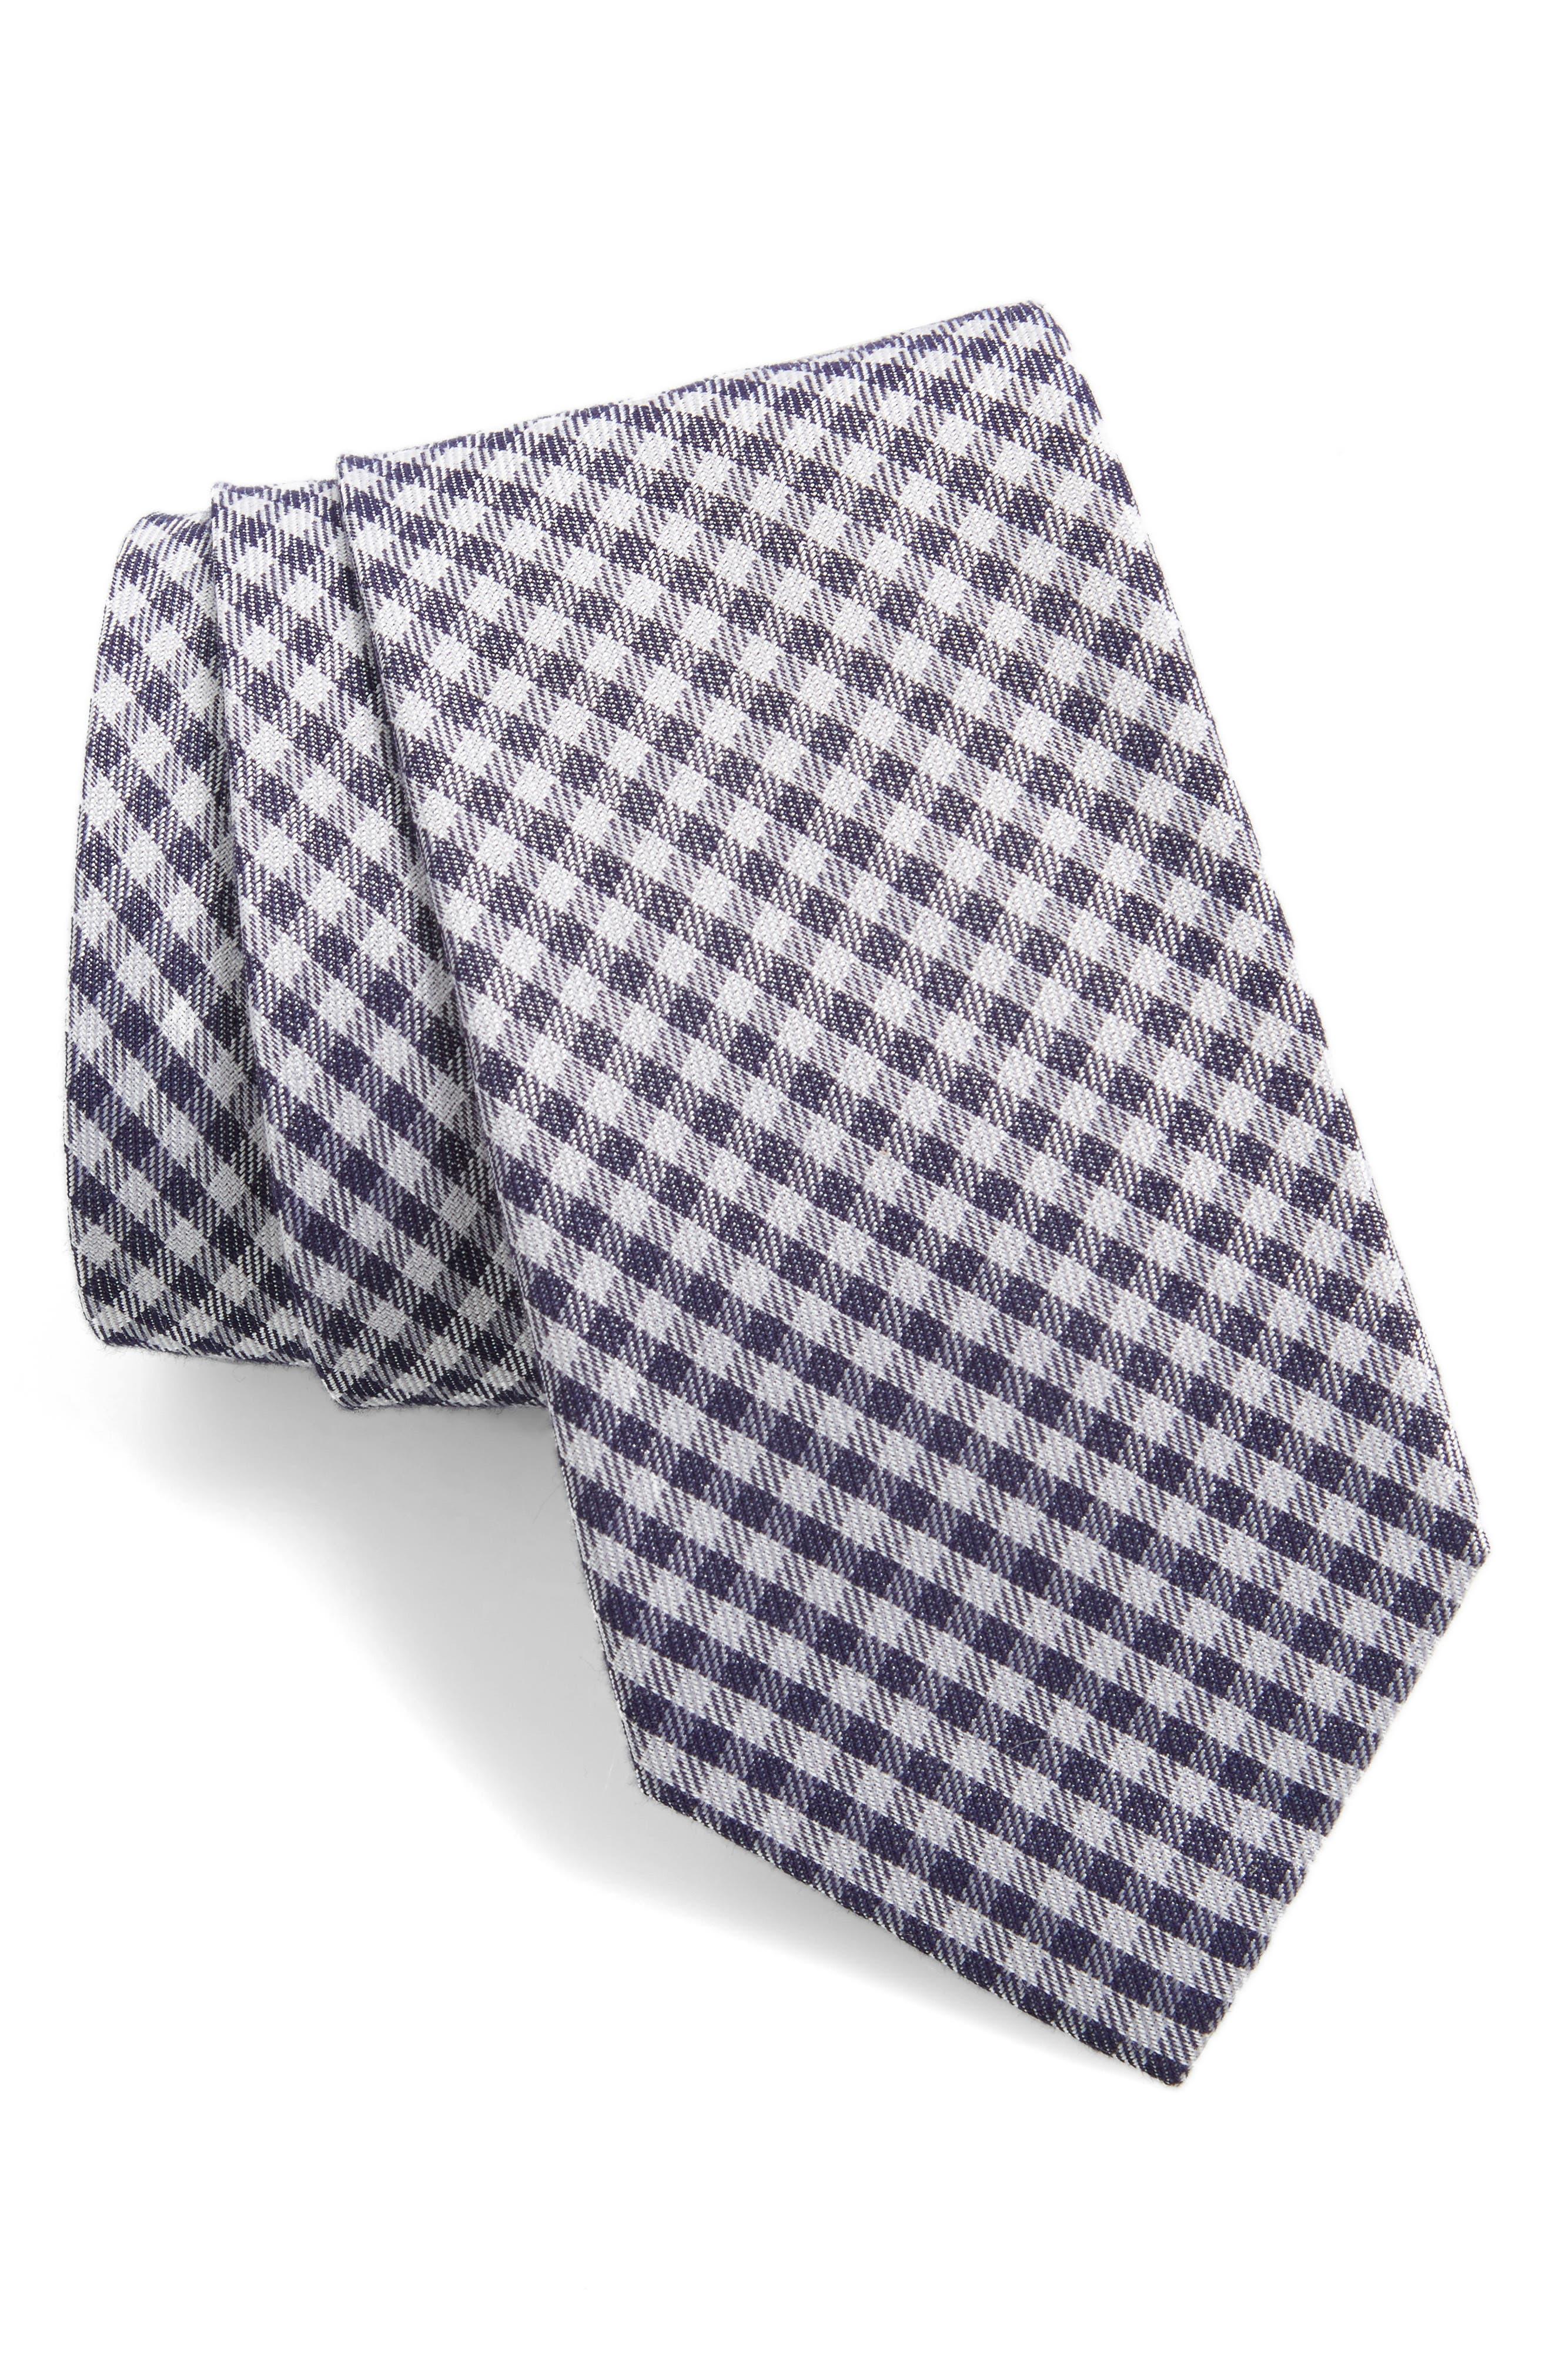 Main Image - Nordstrom Men's Shop Check Cotton & Silk Tie